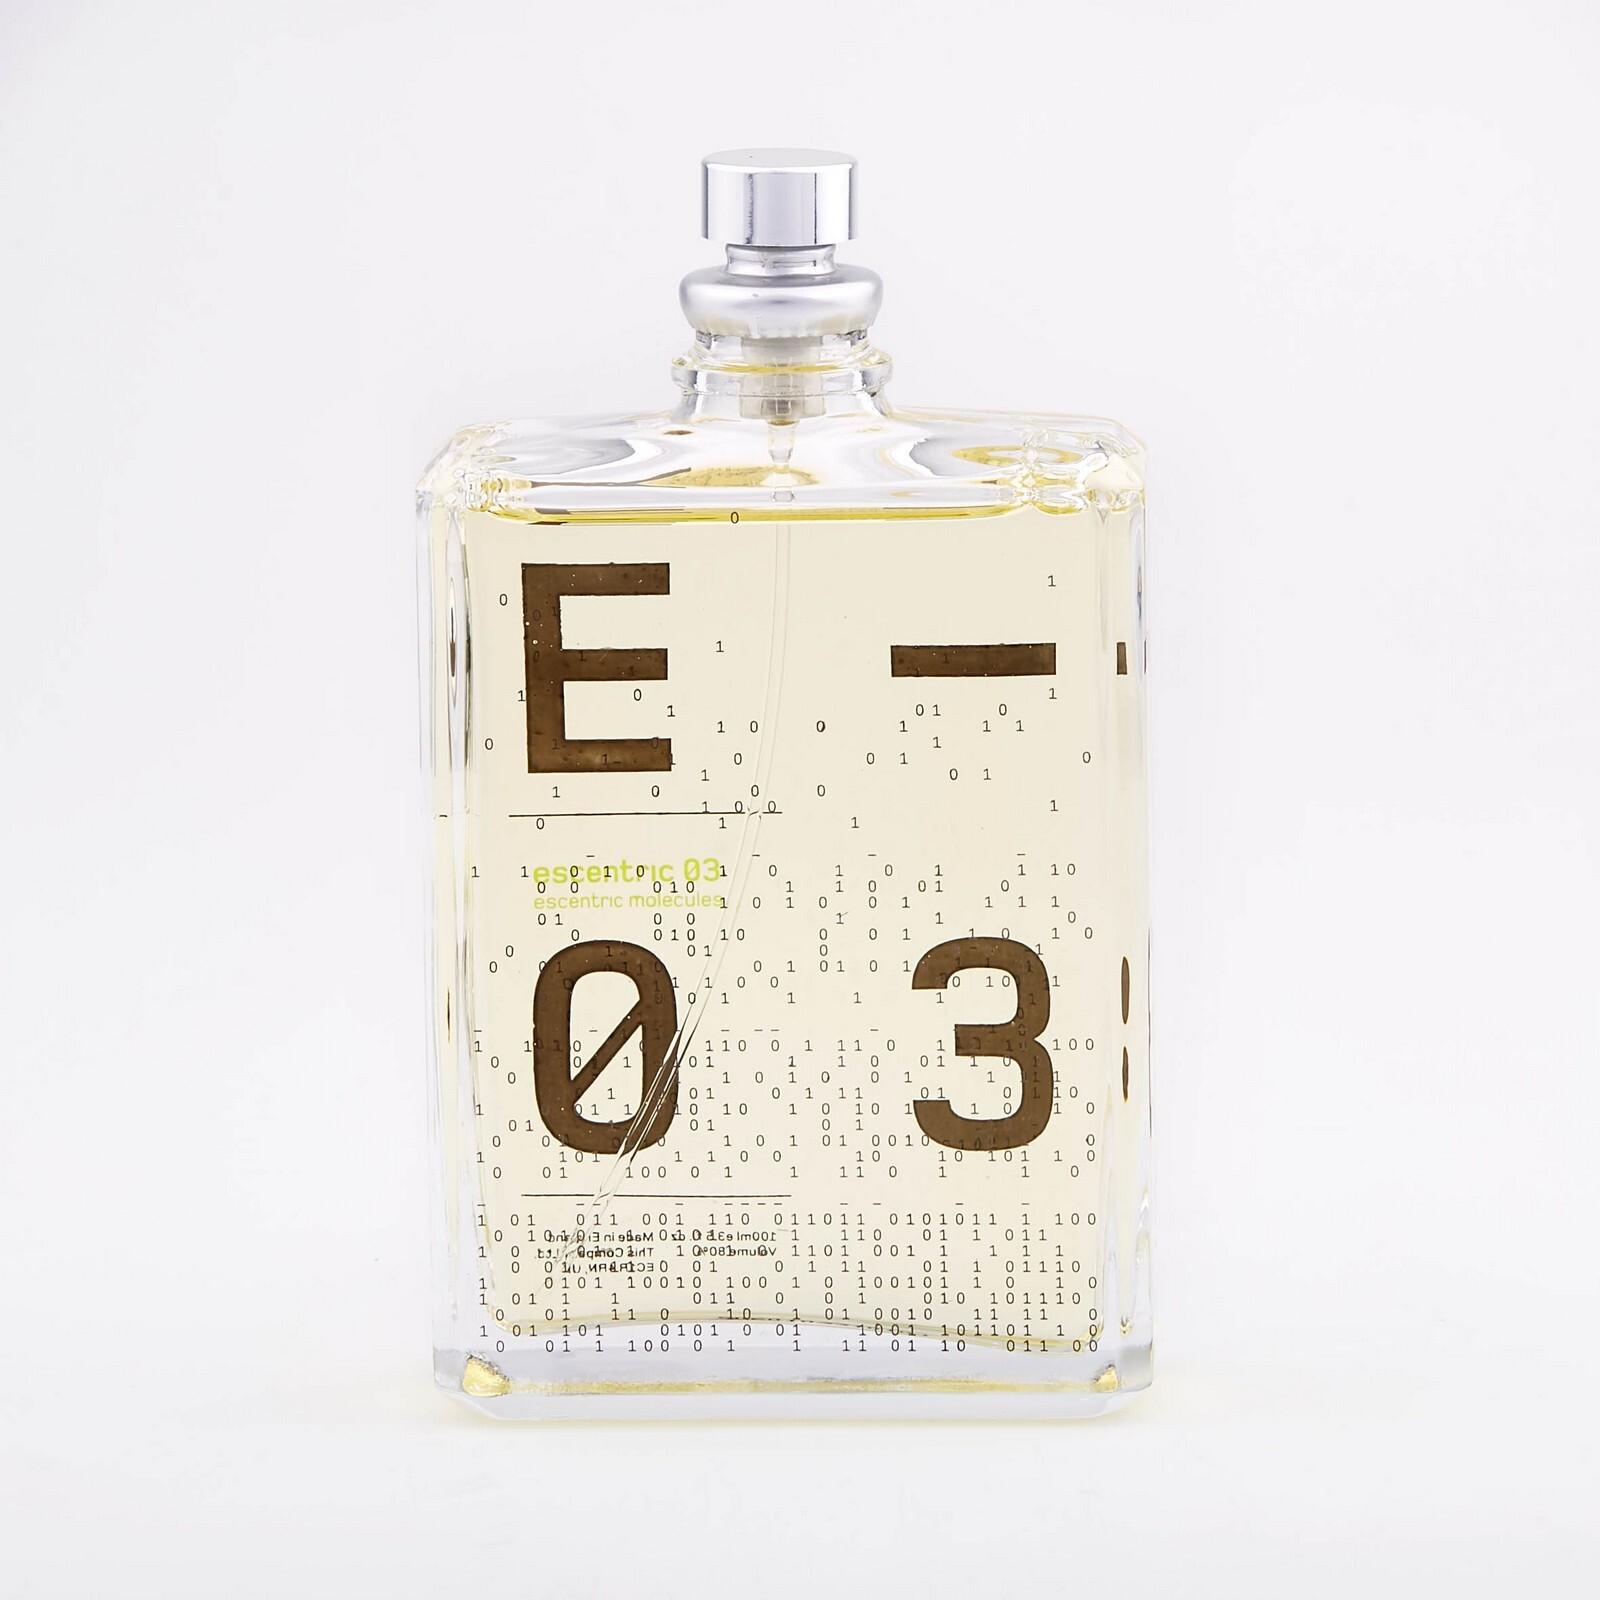 Туалетная вода (тестер) 100 мл Escentric Molecules Escentric 03